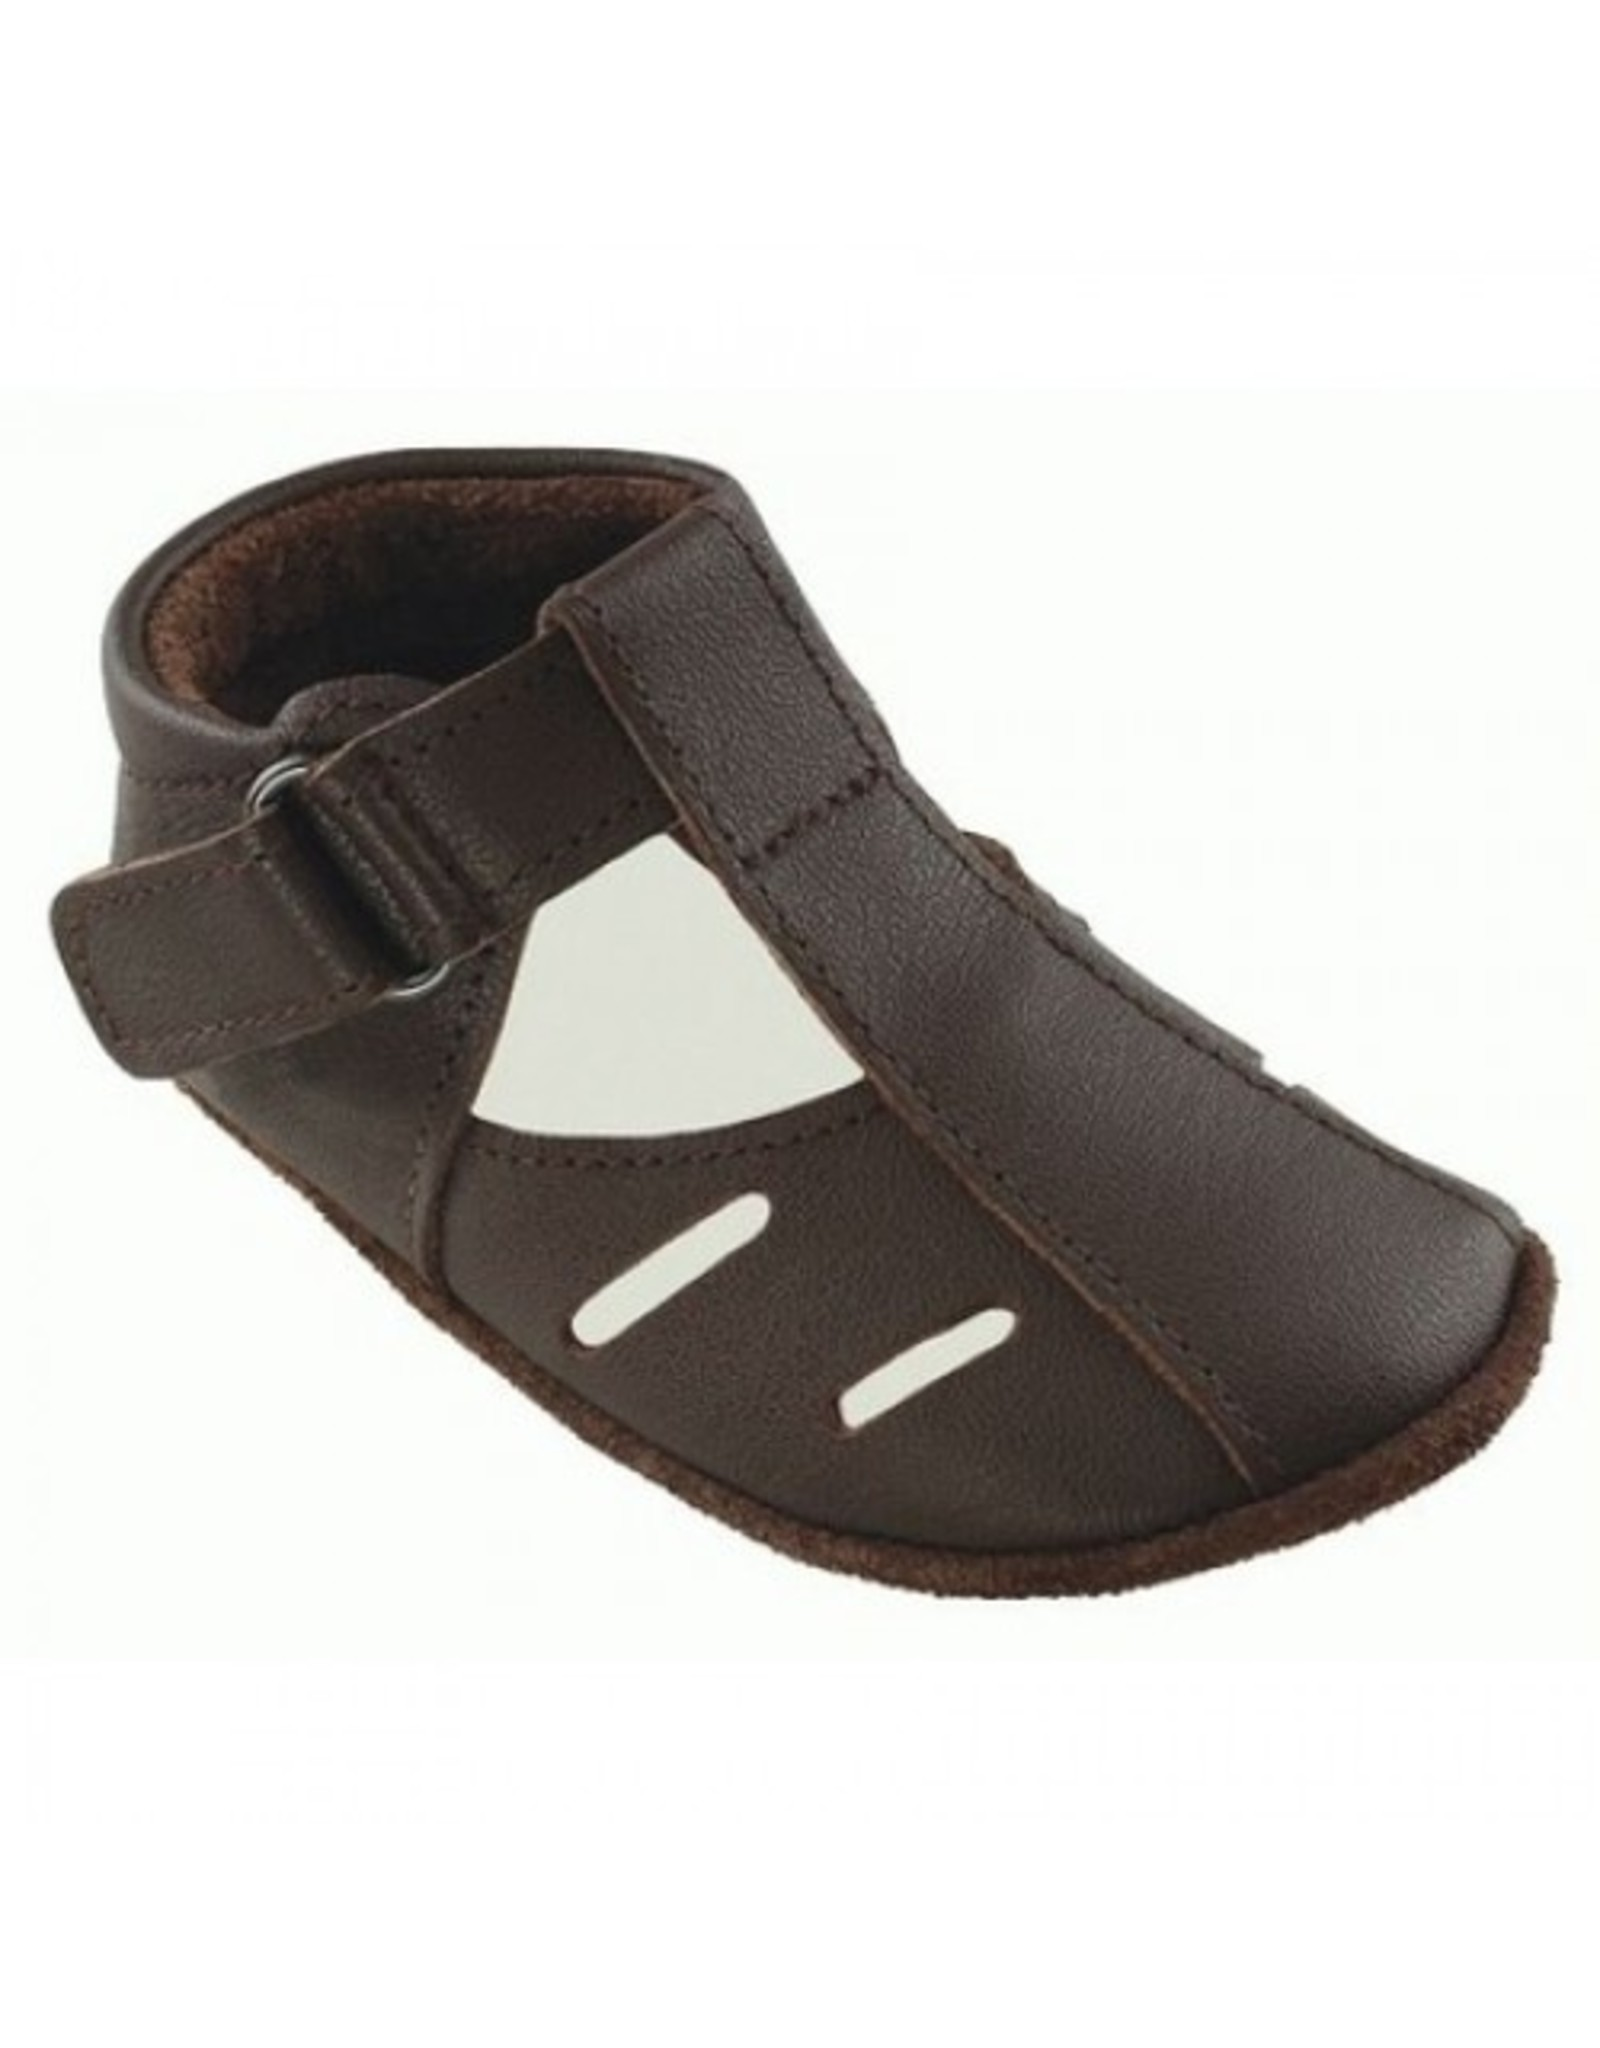 Baby Paws Baby Paws Schoentjes Summa Sandal Chocolade Bruin